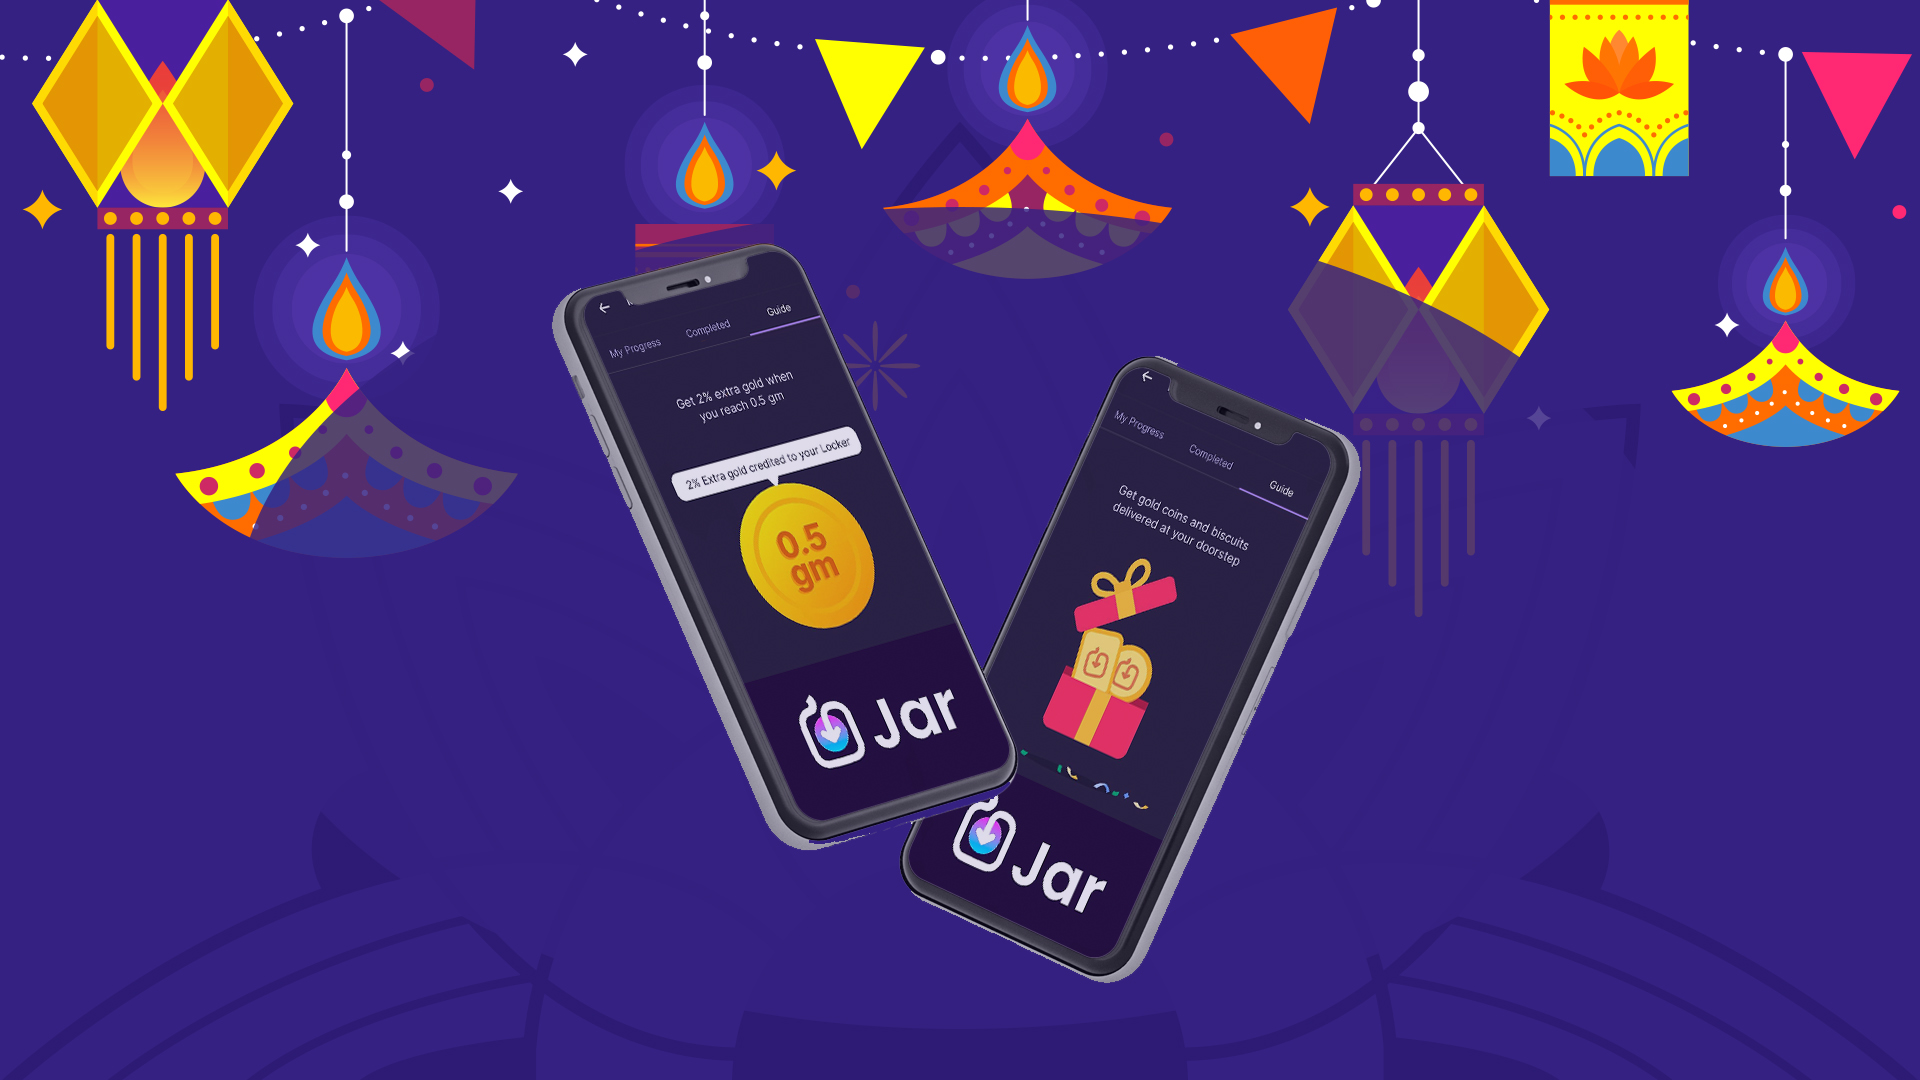 It's Raining Offers at Jar this festive season!  Buy Gold on Jar App Now!